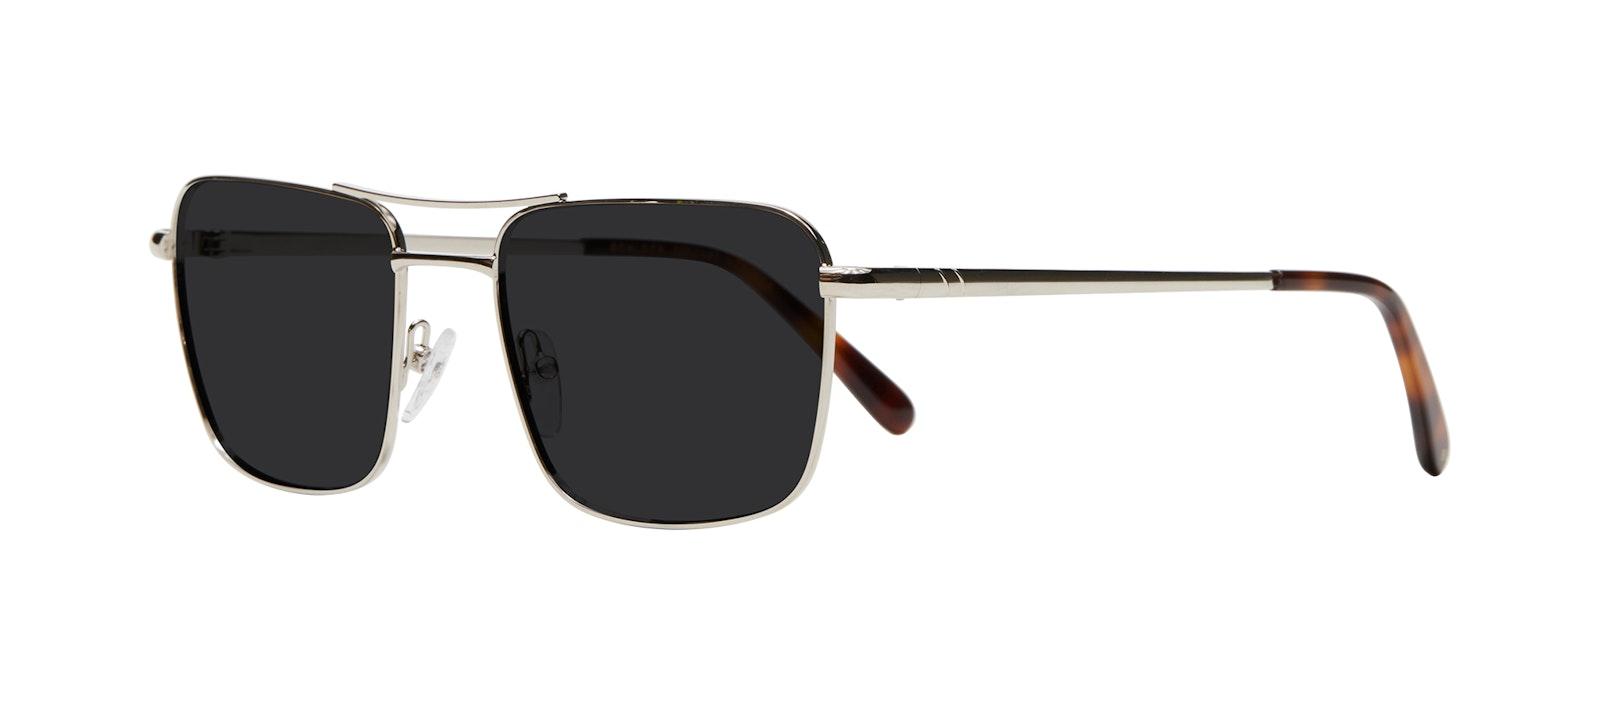 Affordable Fashion Glasses Aviator Sunglasses Men Emerge Silver Tilt